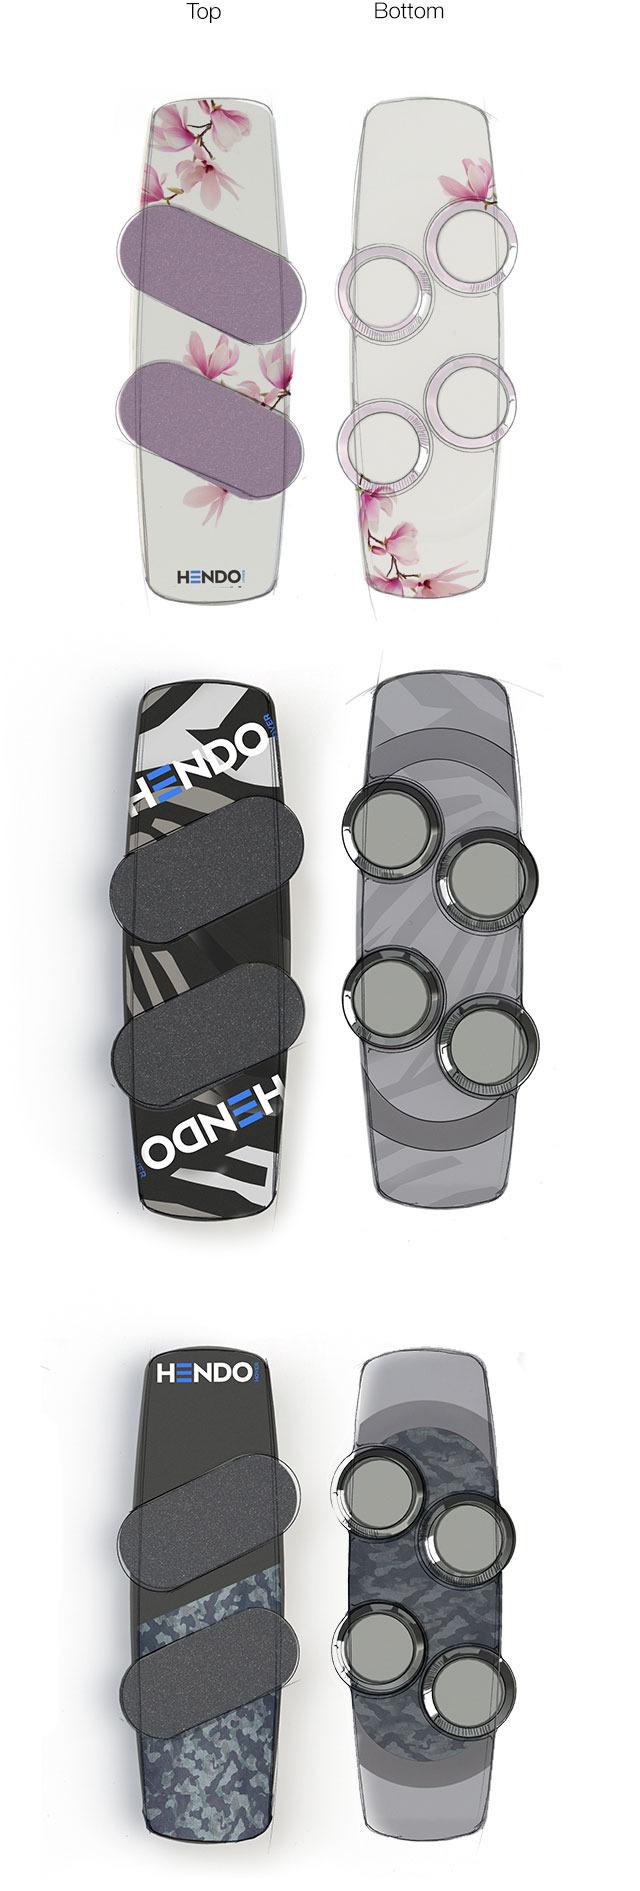 hendo-hoberboard-skate-futur-03